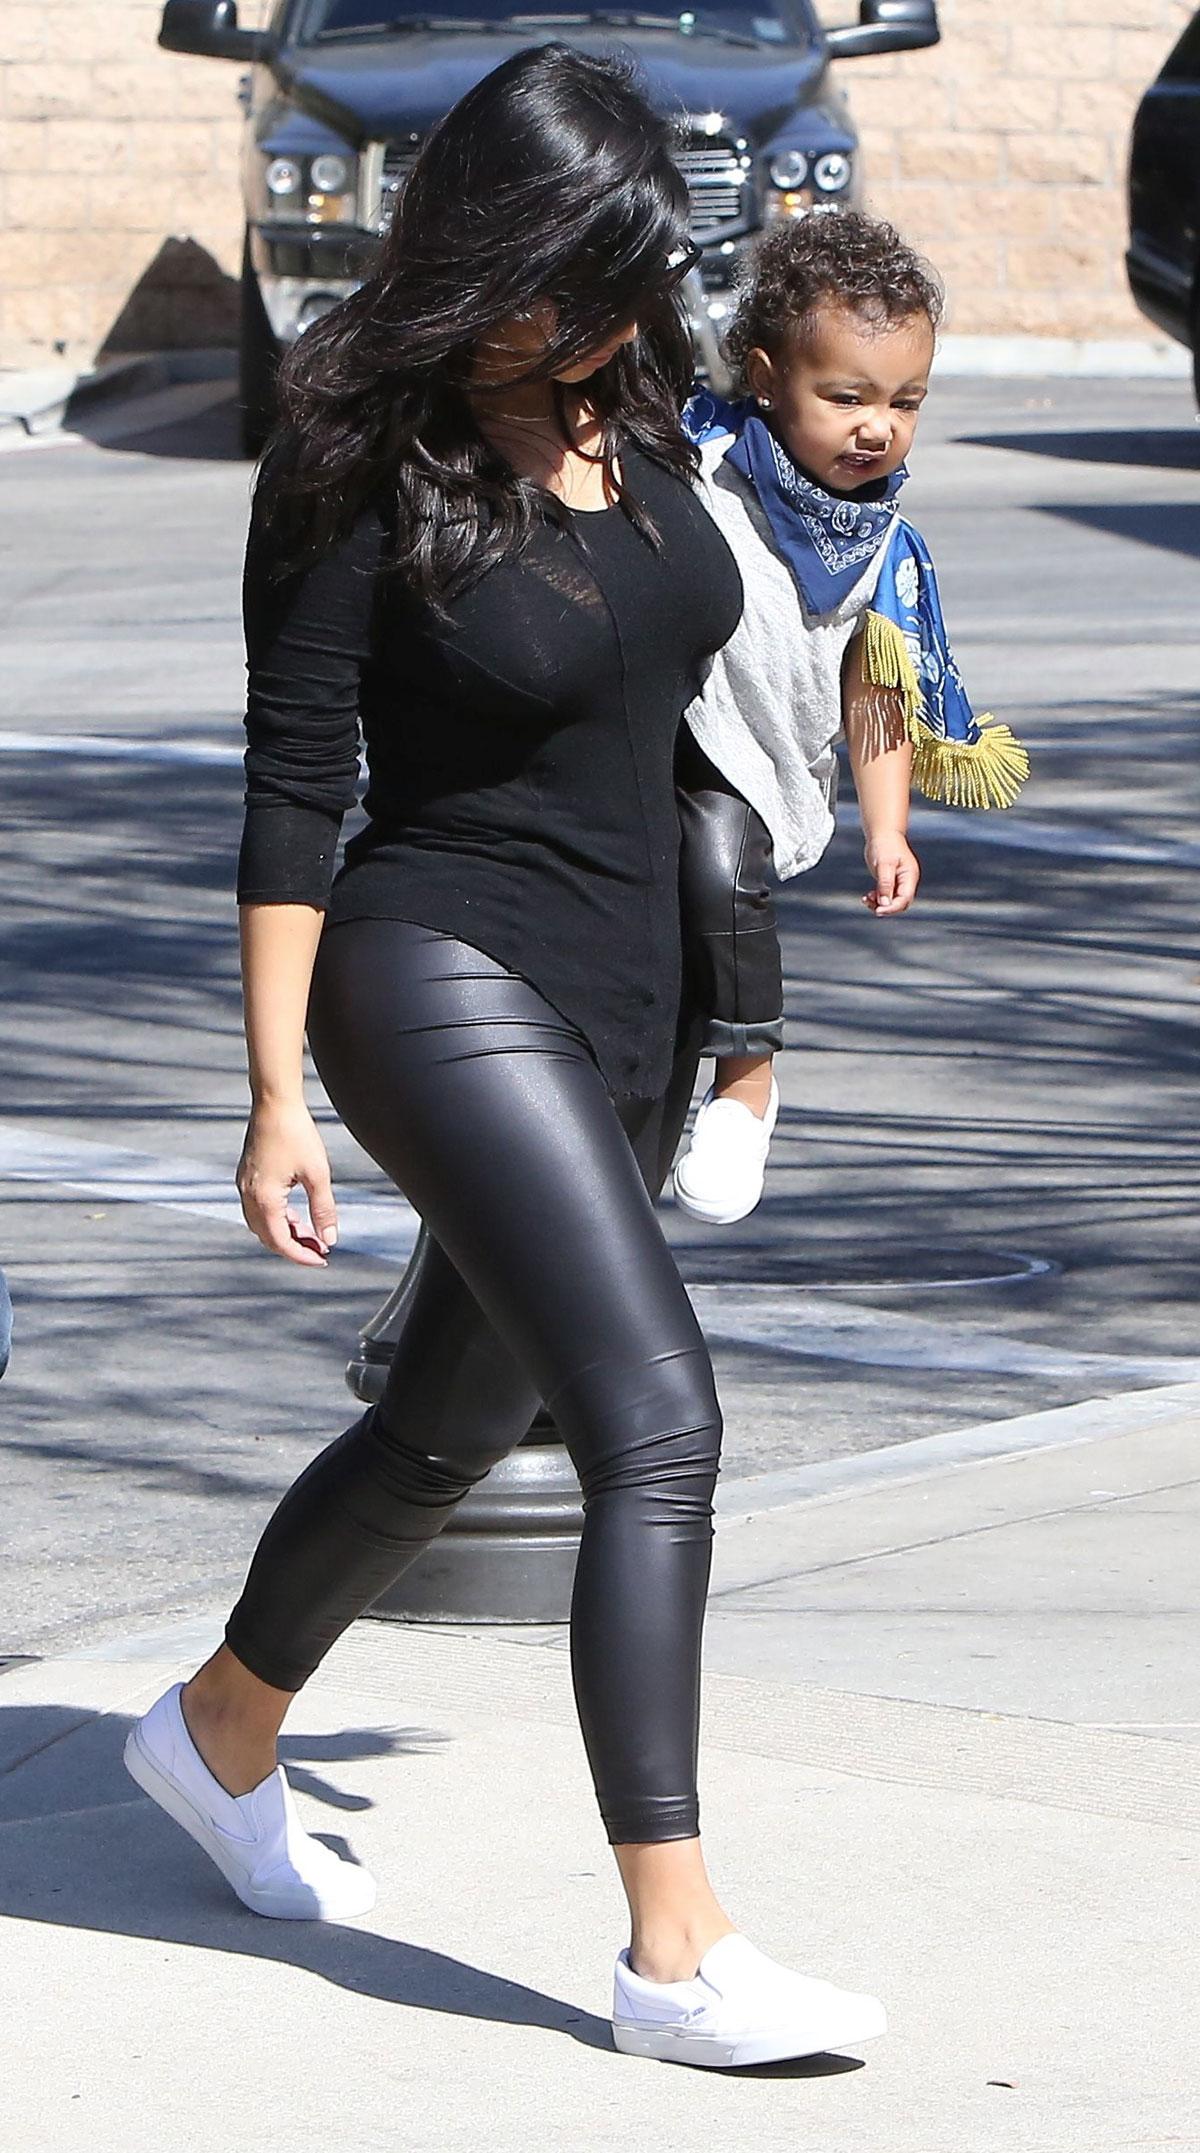 Kim Kardashian leaving The Grill in Calabasas